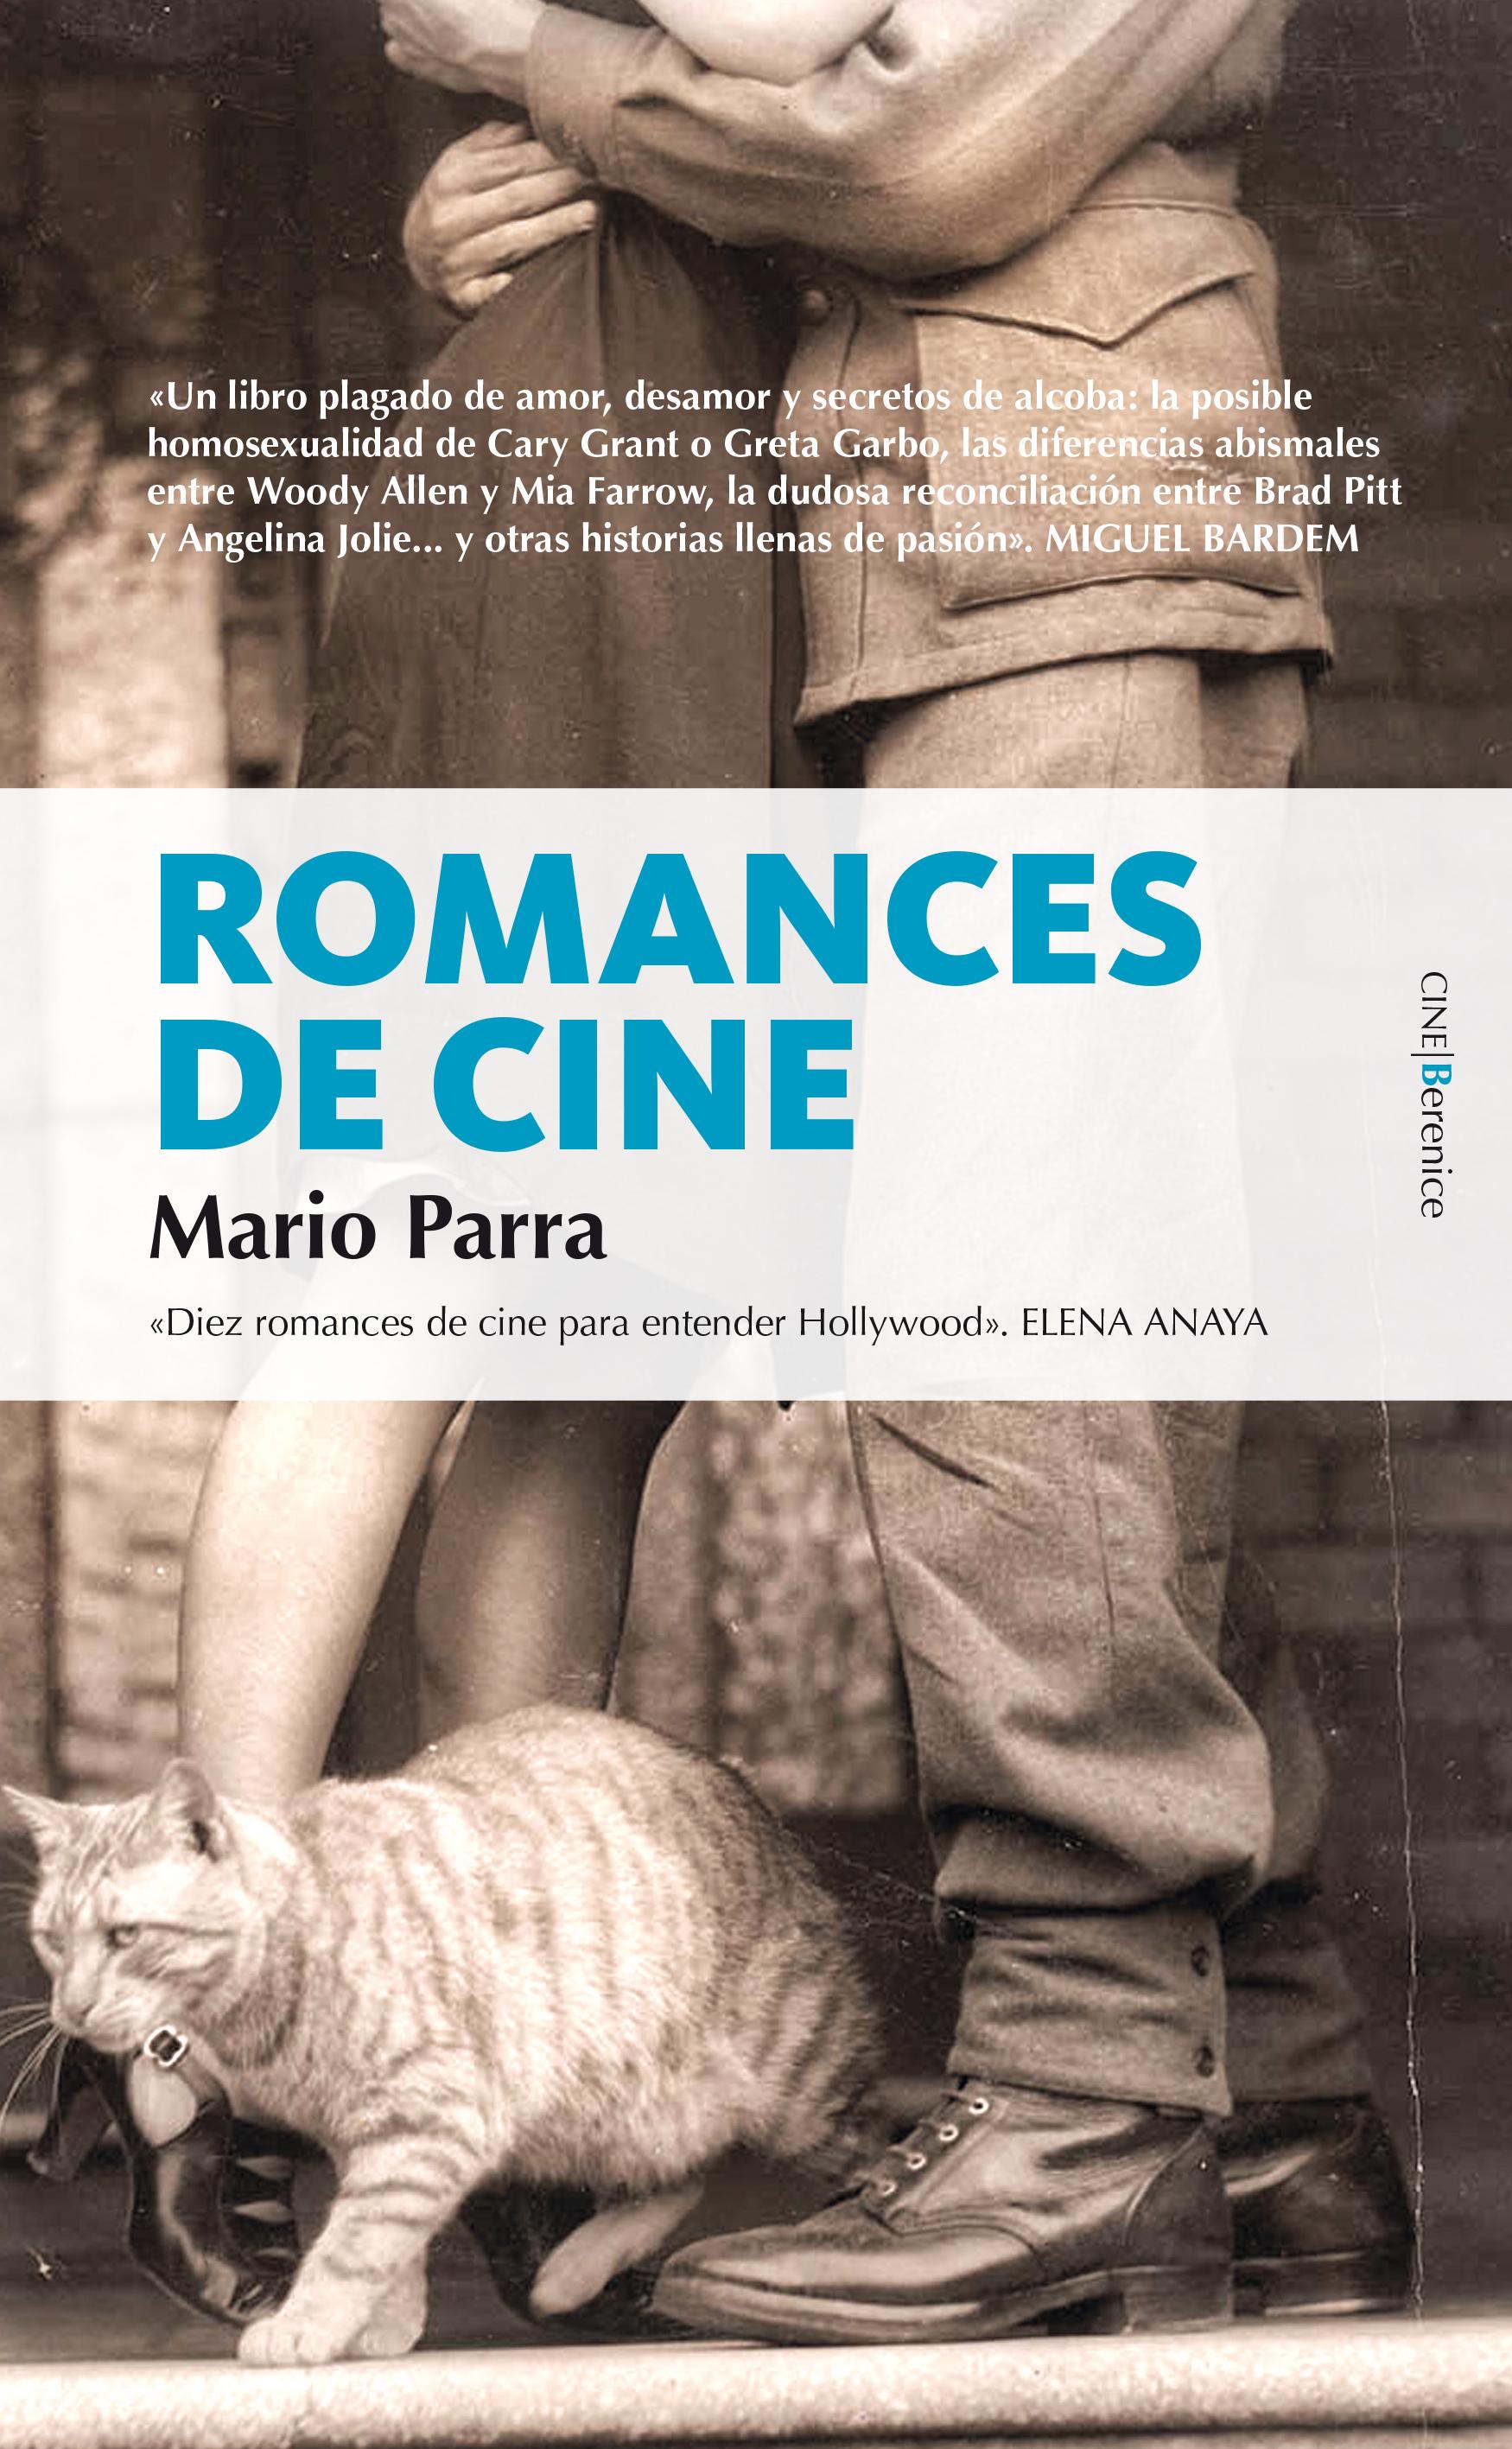 Resultado de imagen para Romances de cine